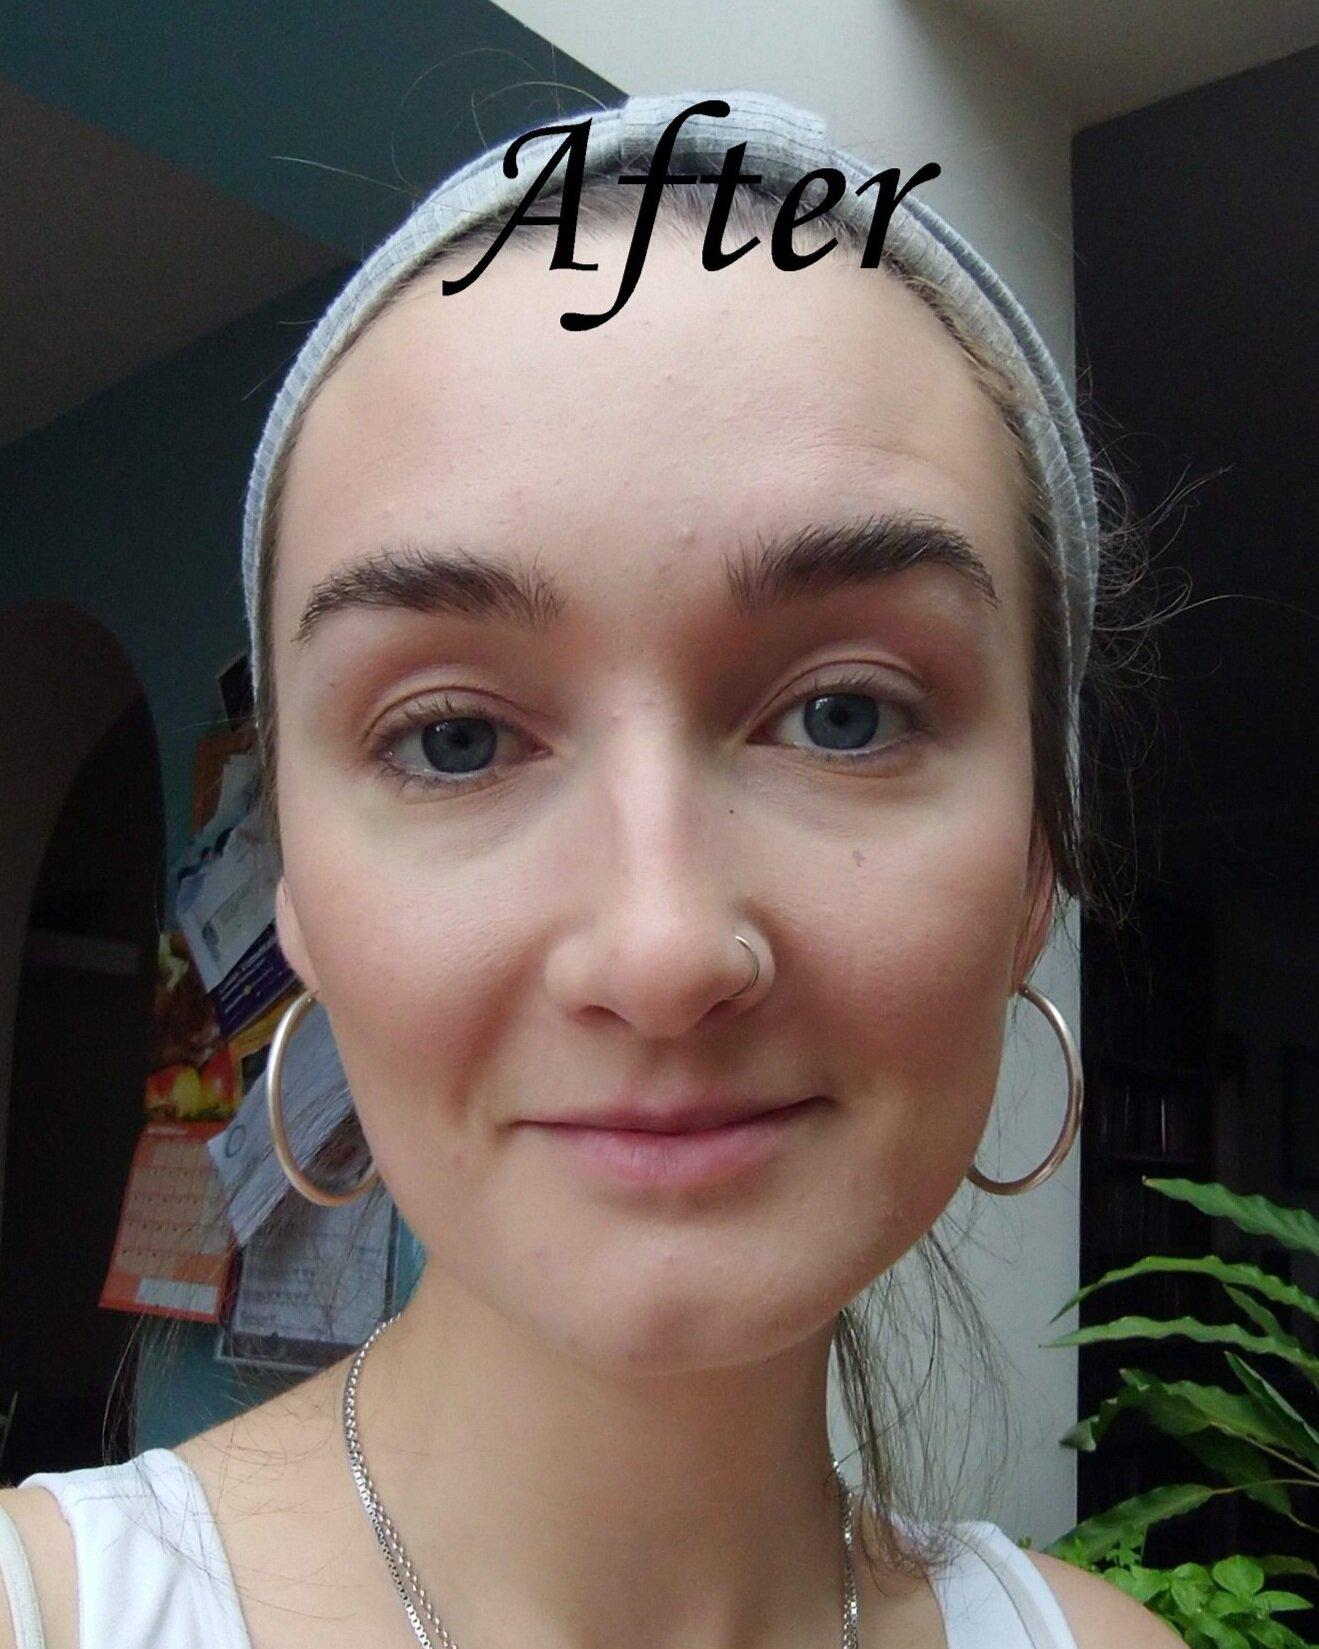 Smooth, even, natural looking makeup